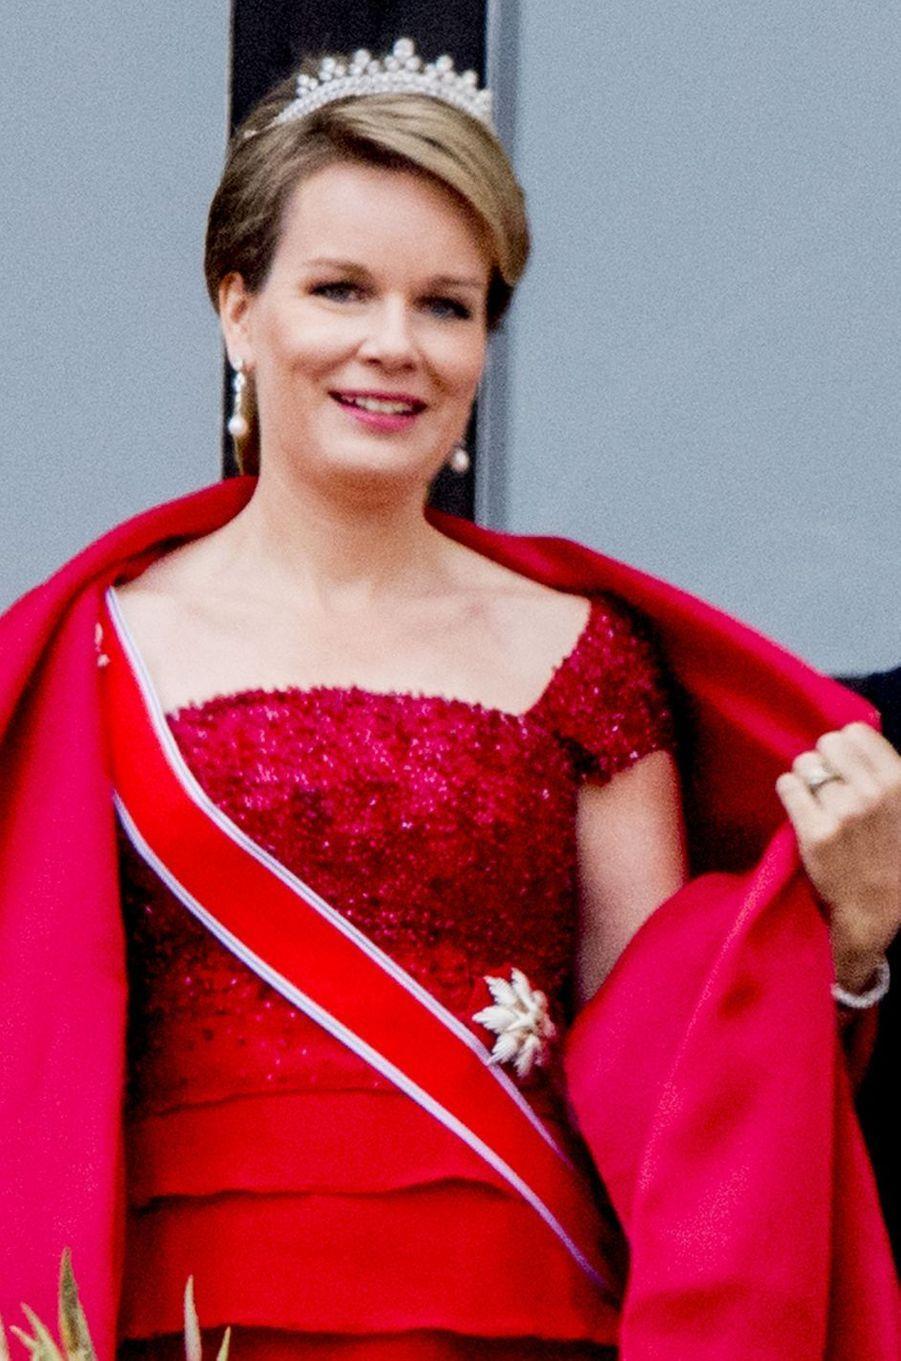 Le diadème de lareine Mathilde de Belgique à Oslo le 9 mai 2017